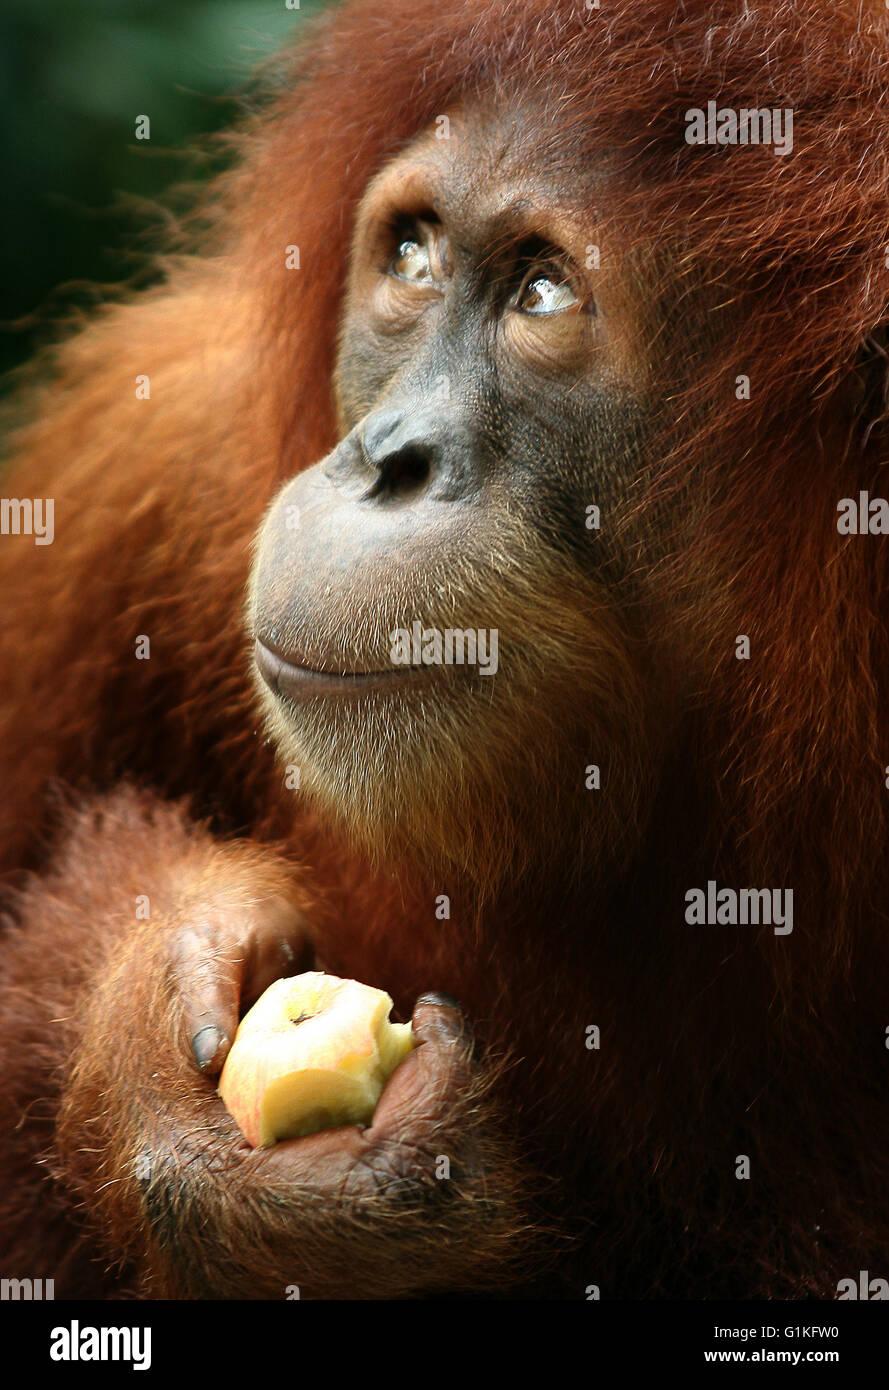 Orangután mono Imagen De Stock